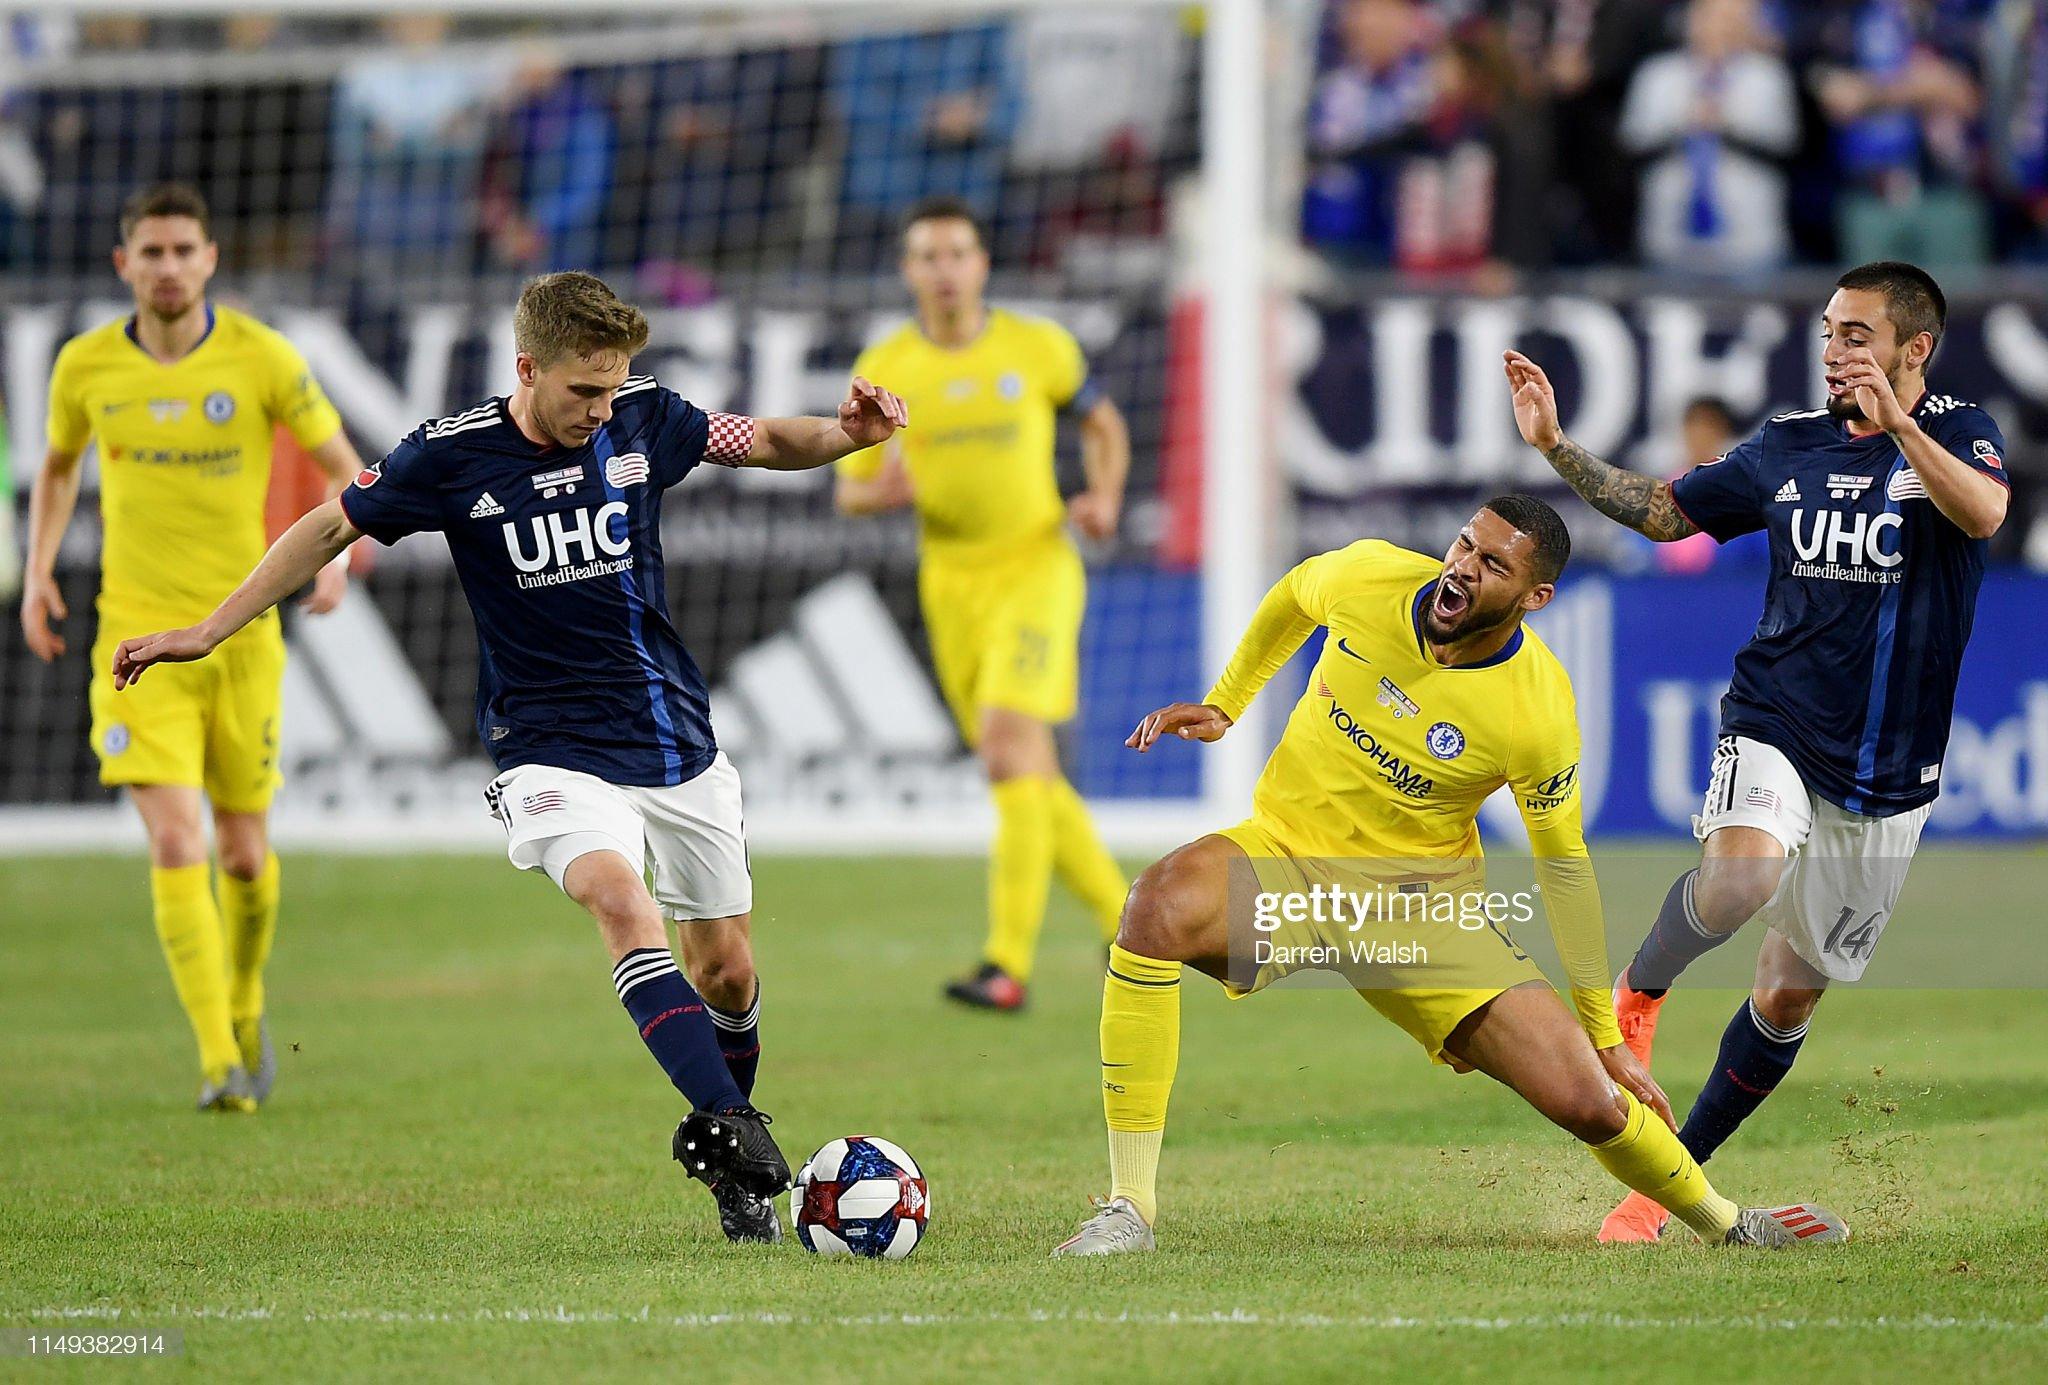 New England Revolution v Chelsea - Friendly Match : News Photo